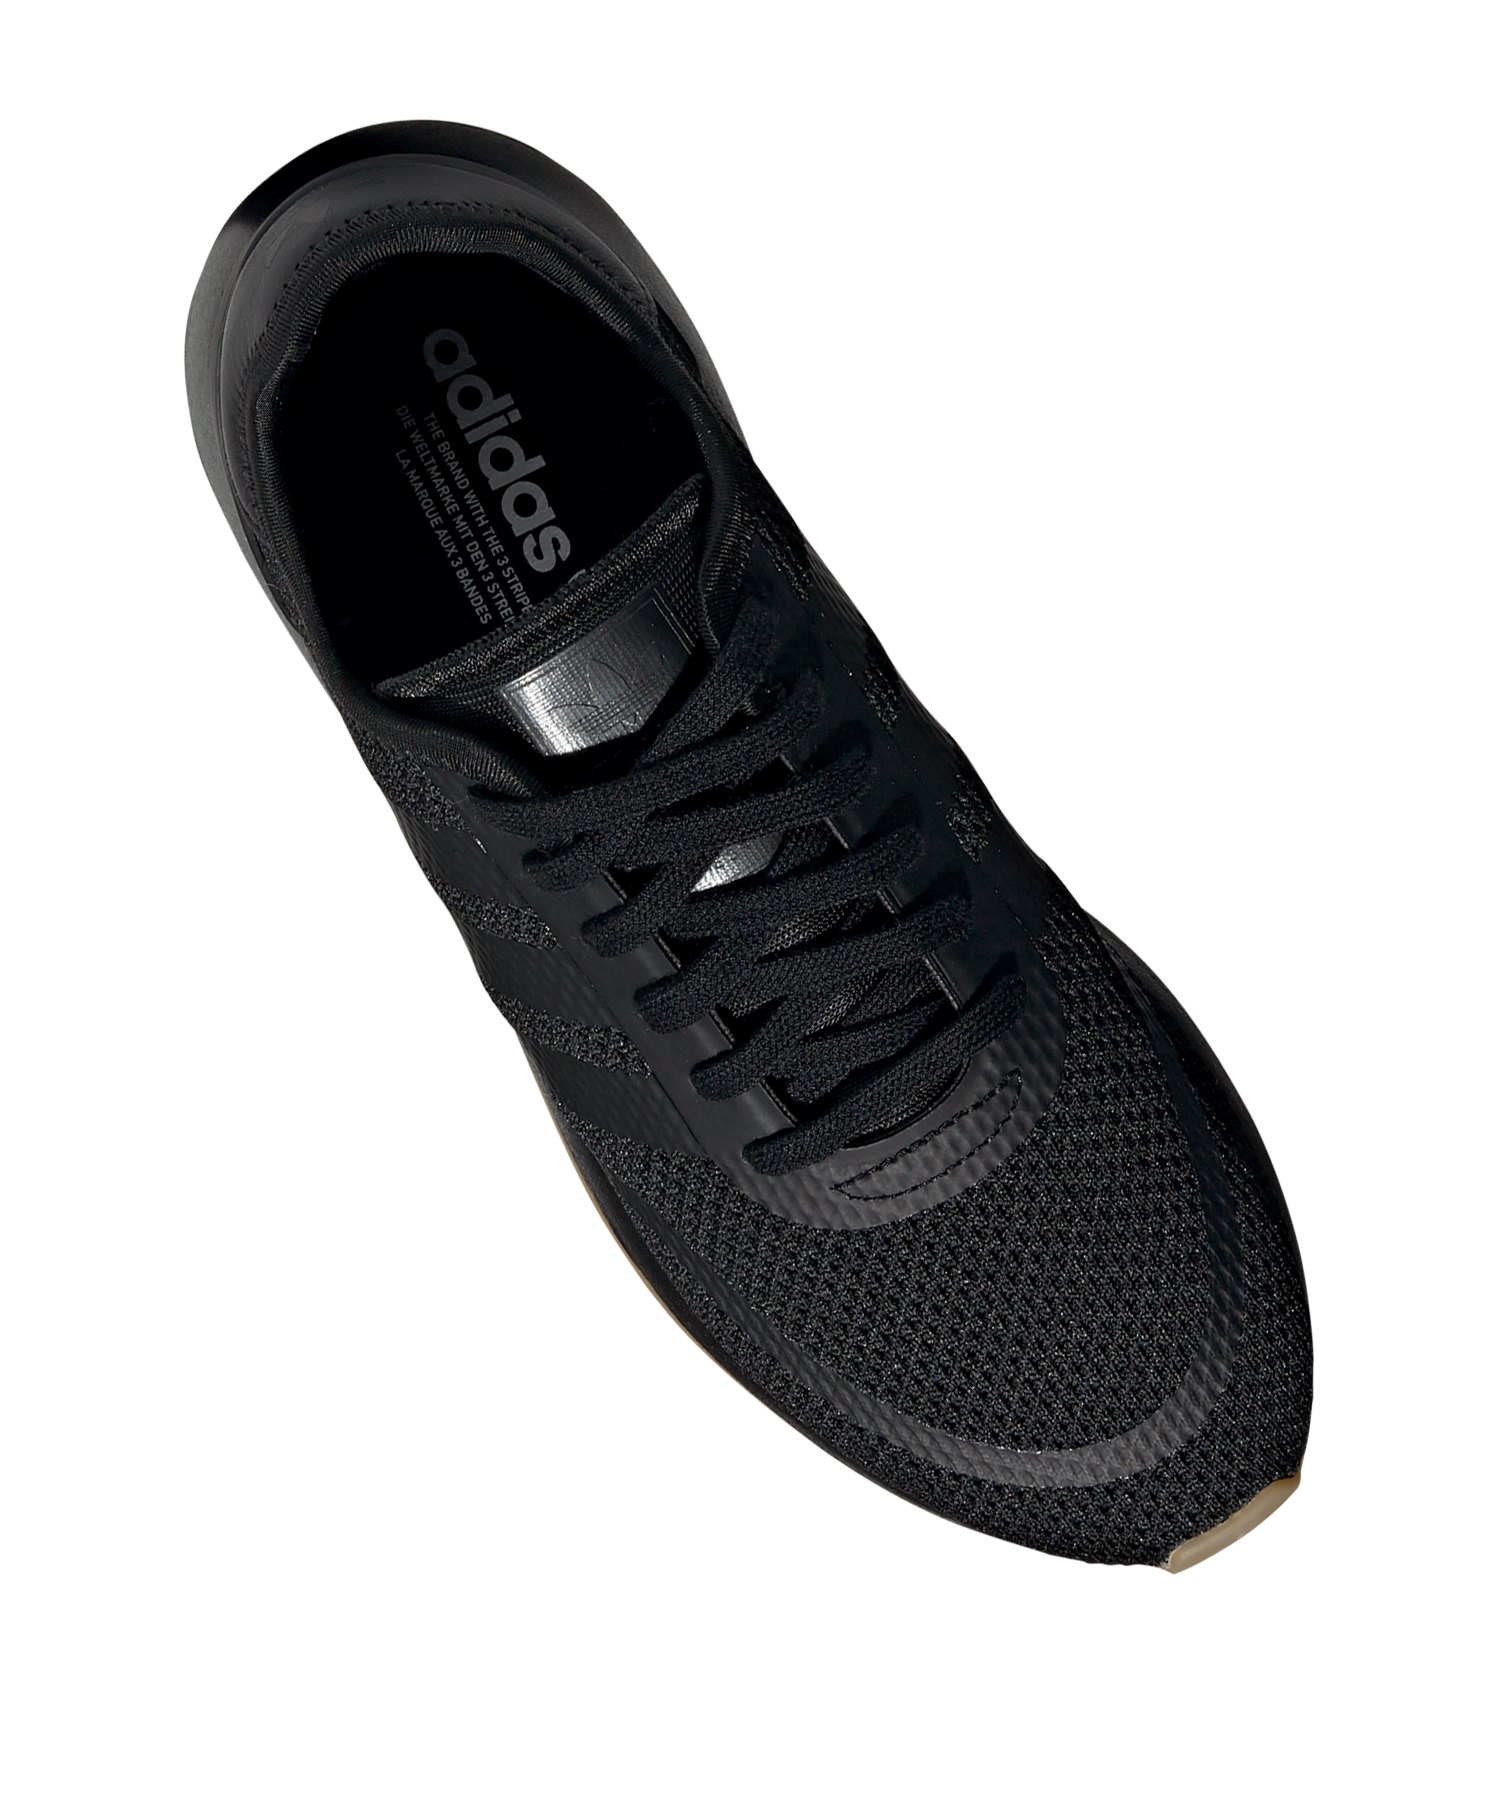 Originals Adidas Sneaker 5923 N Schwarz uJ3lTF51cK